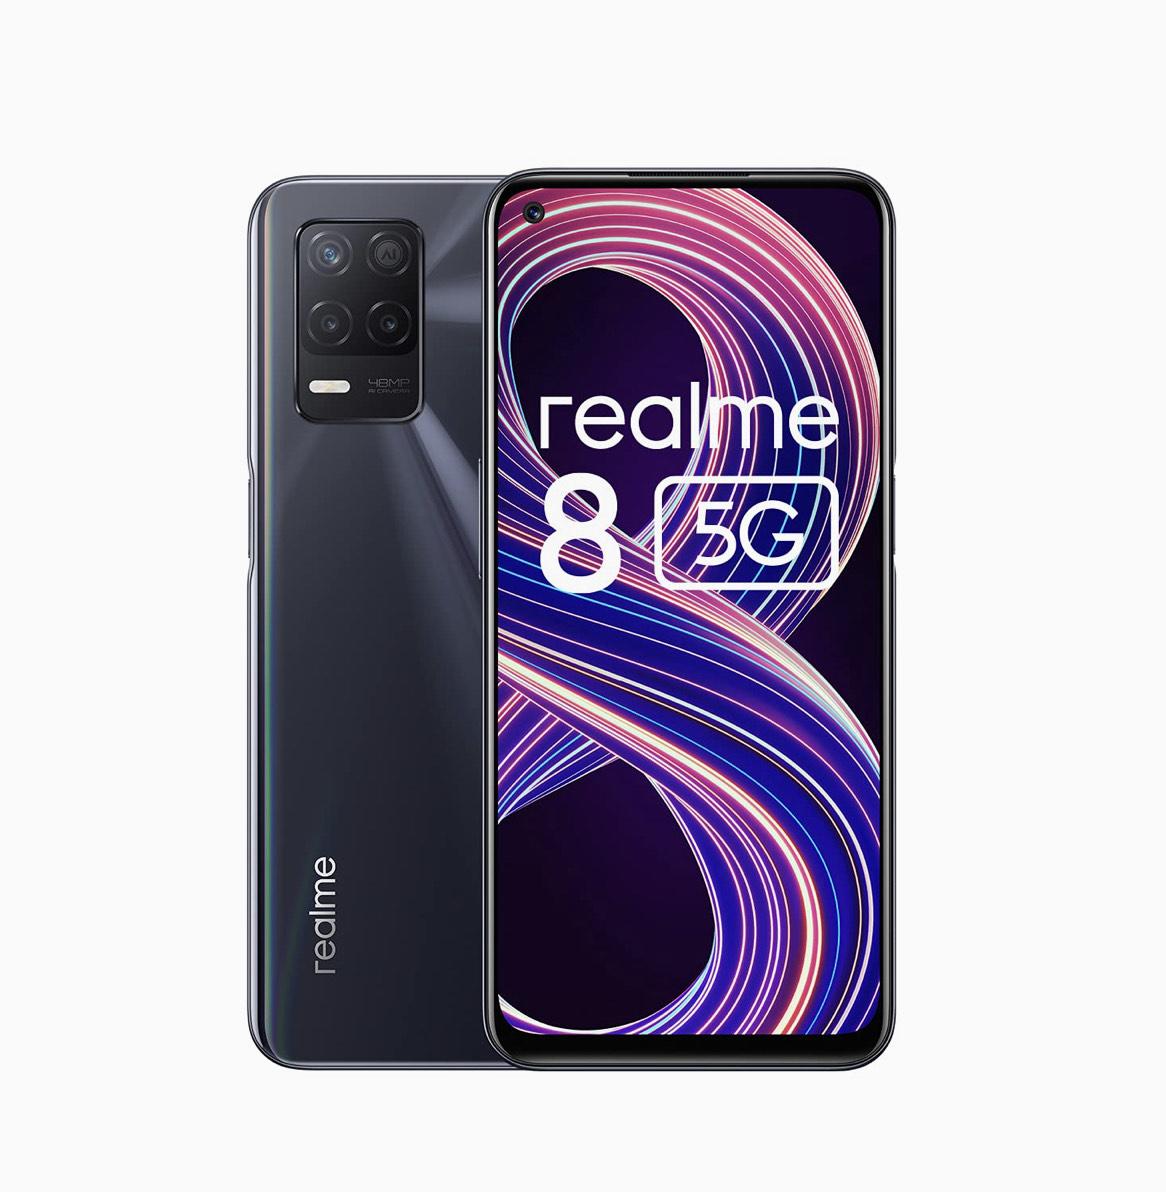 realme 8 5G - 4GB + 64GB - 90Hz Ultra Smooth Display - Dimensity 700 5G Processor - 5000mAH £179 at Amazon